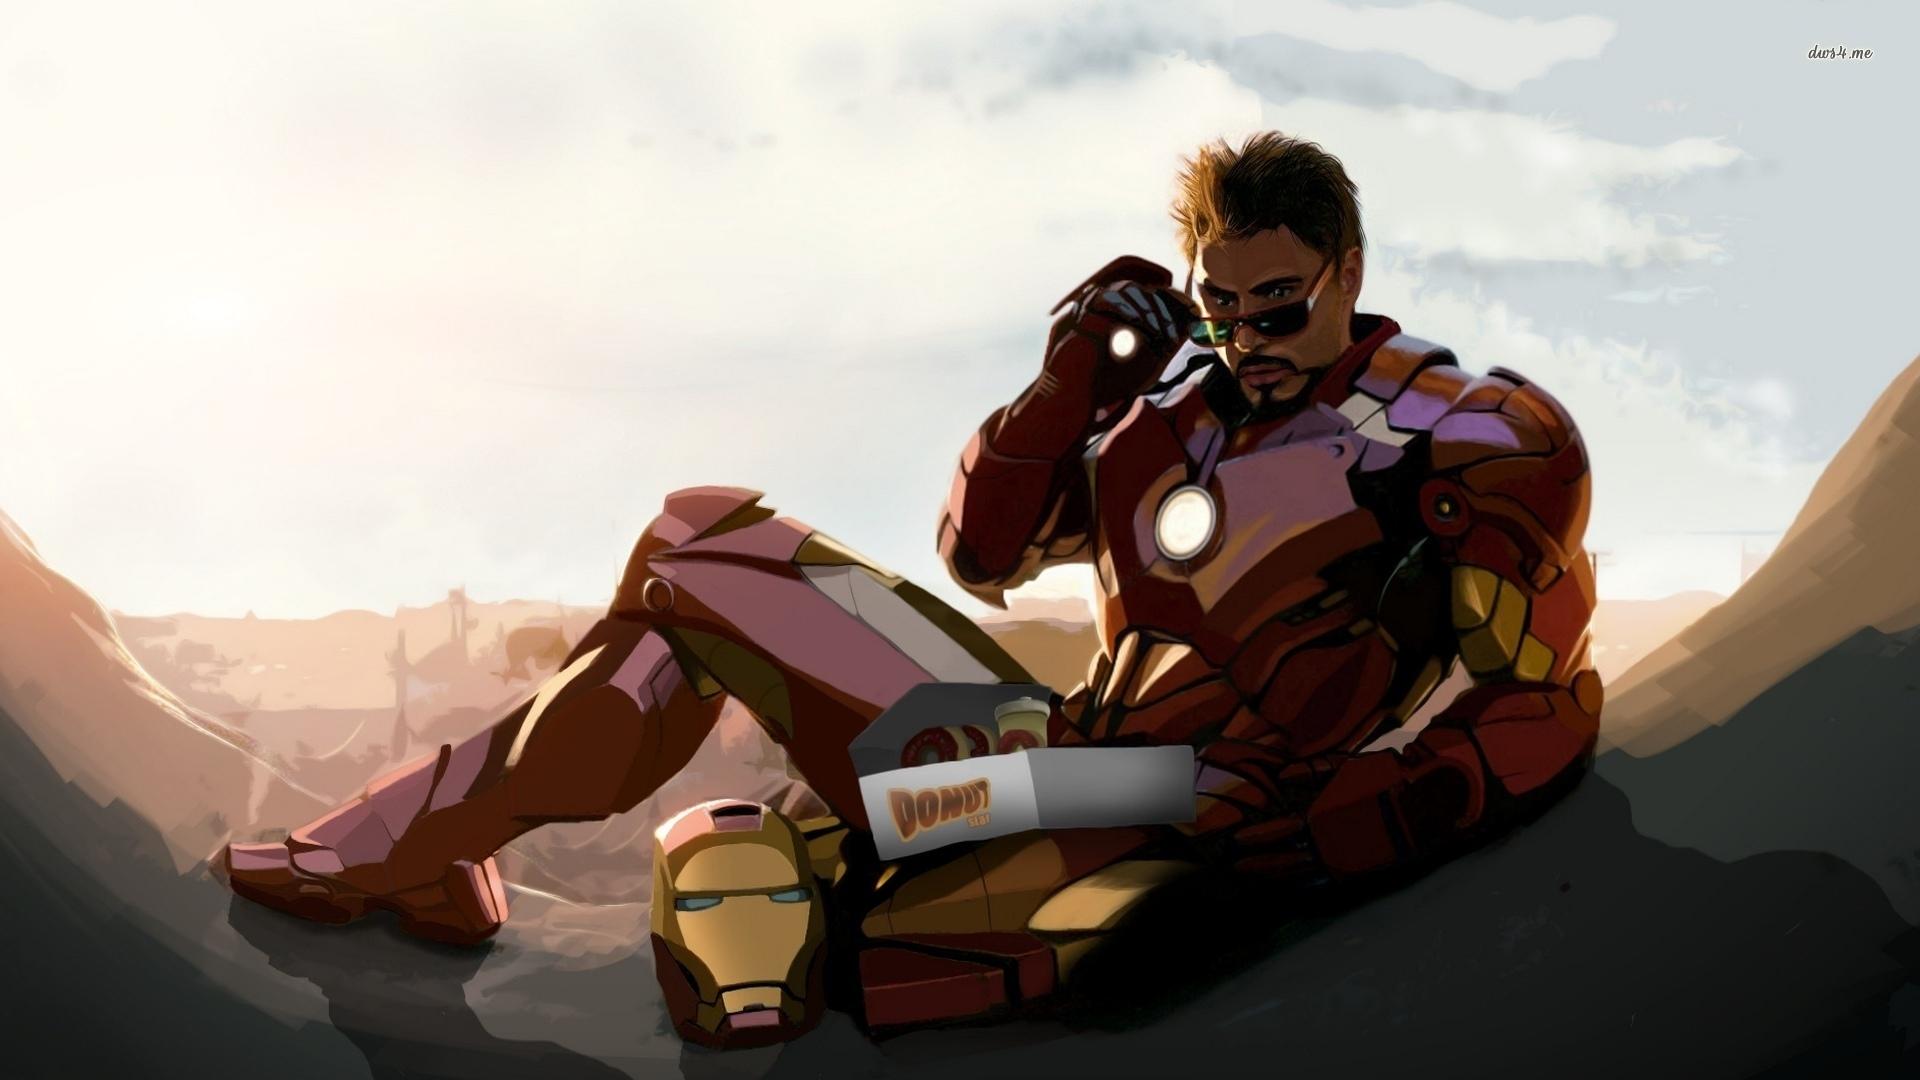 Iron Man Hd Wallpaper: Iron Man Wallpaper Hd (39 Wallpapers)